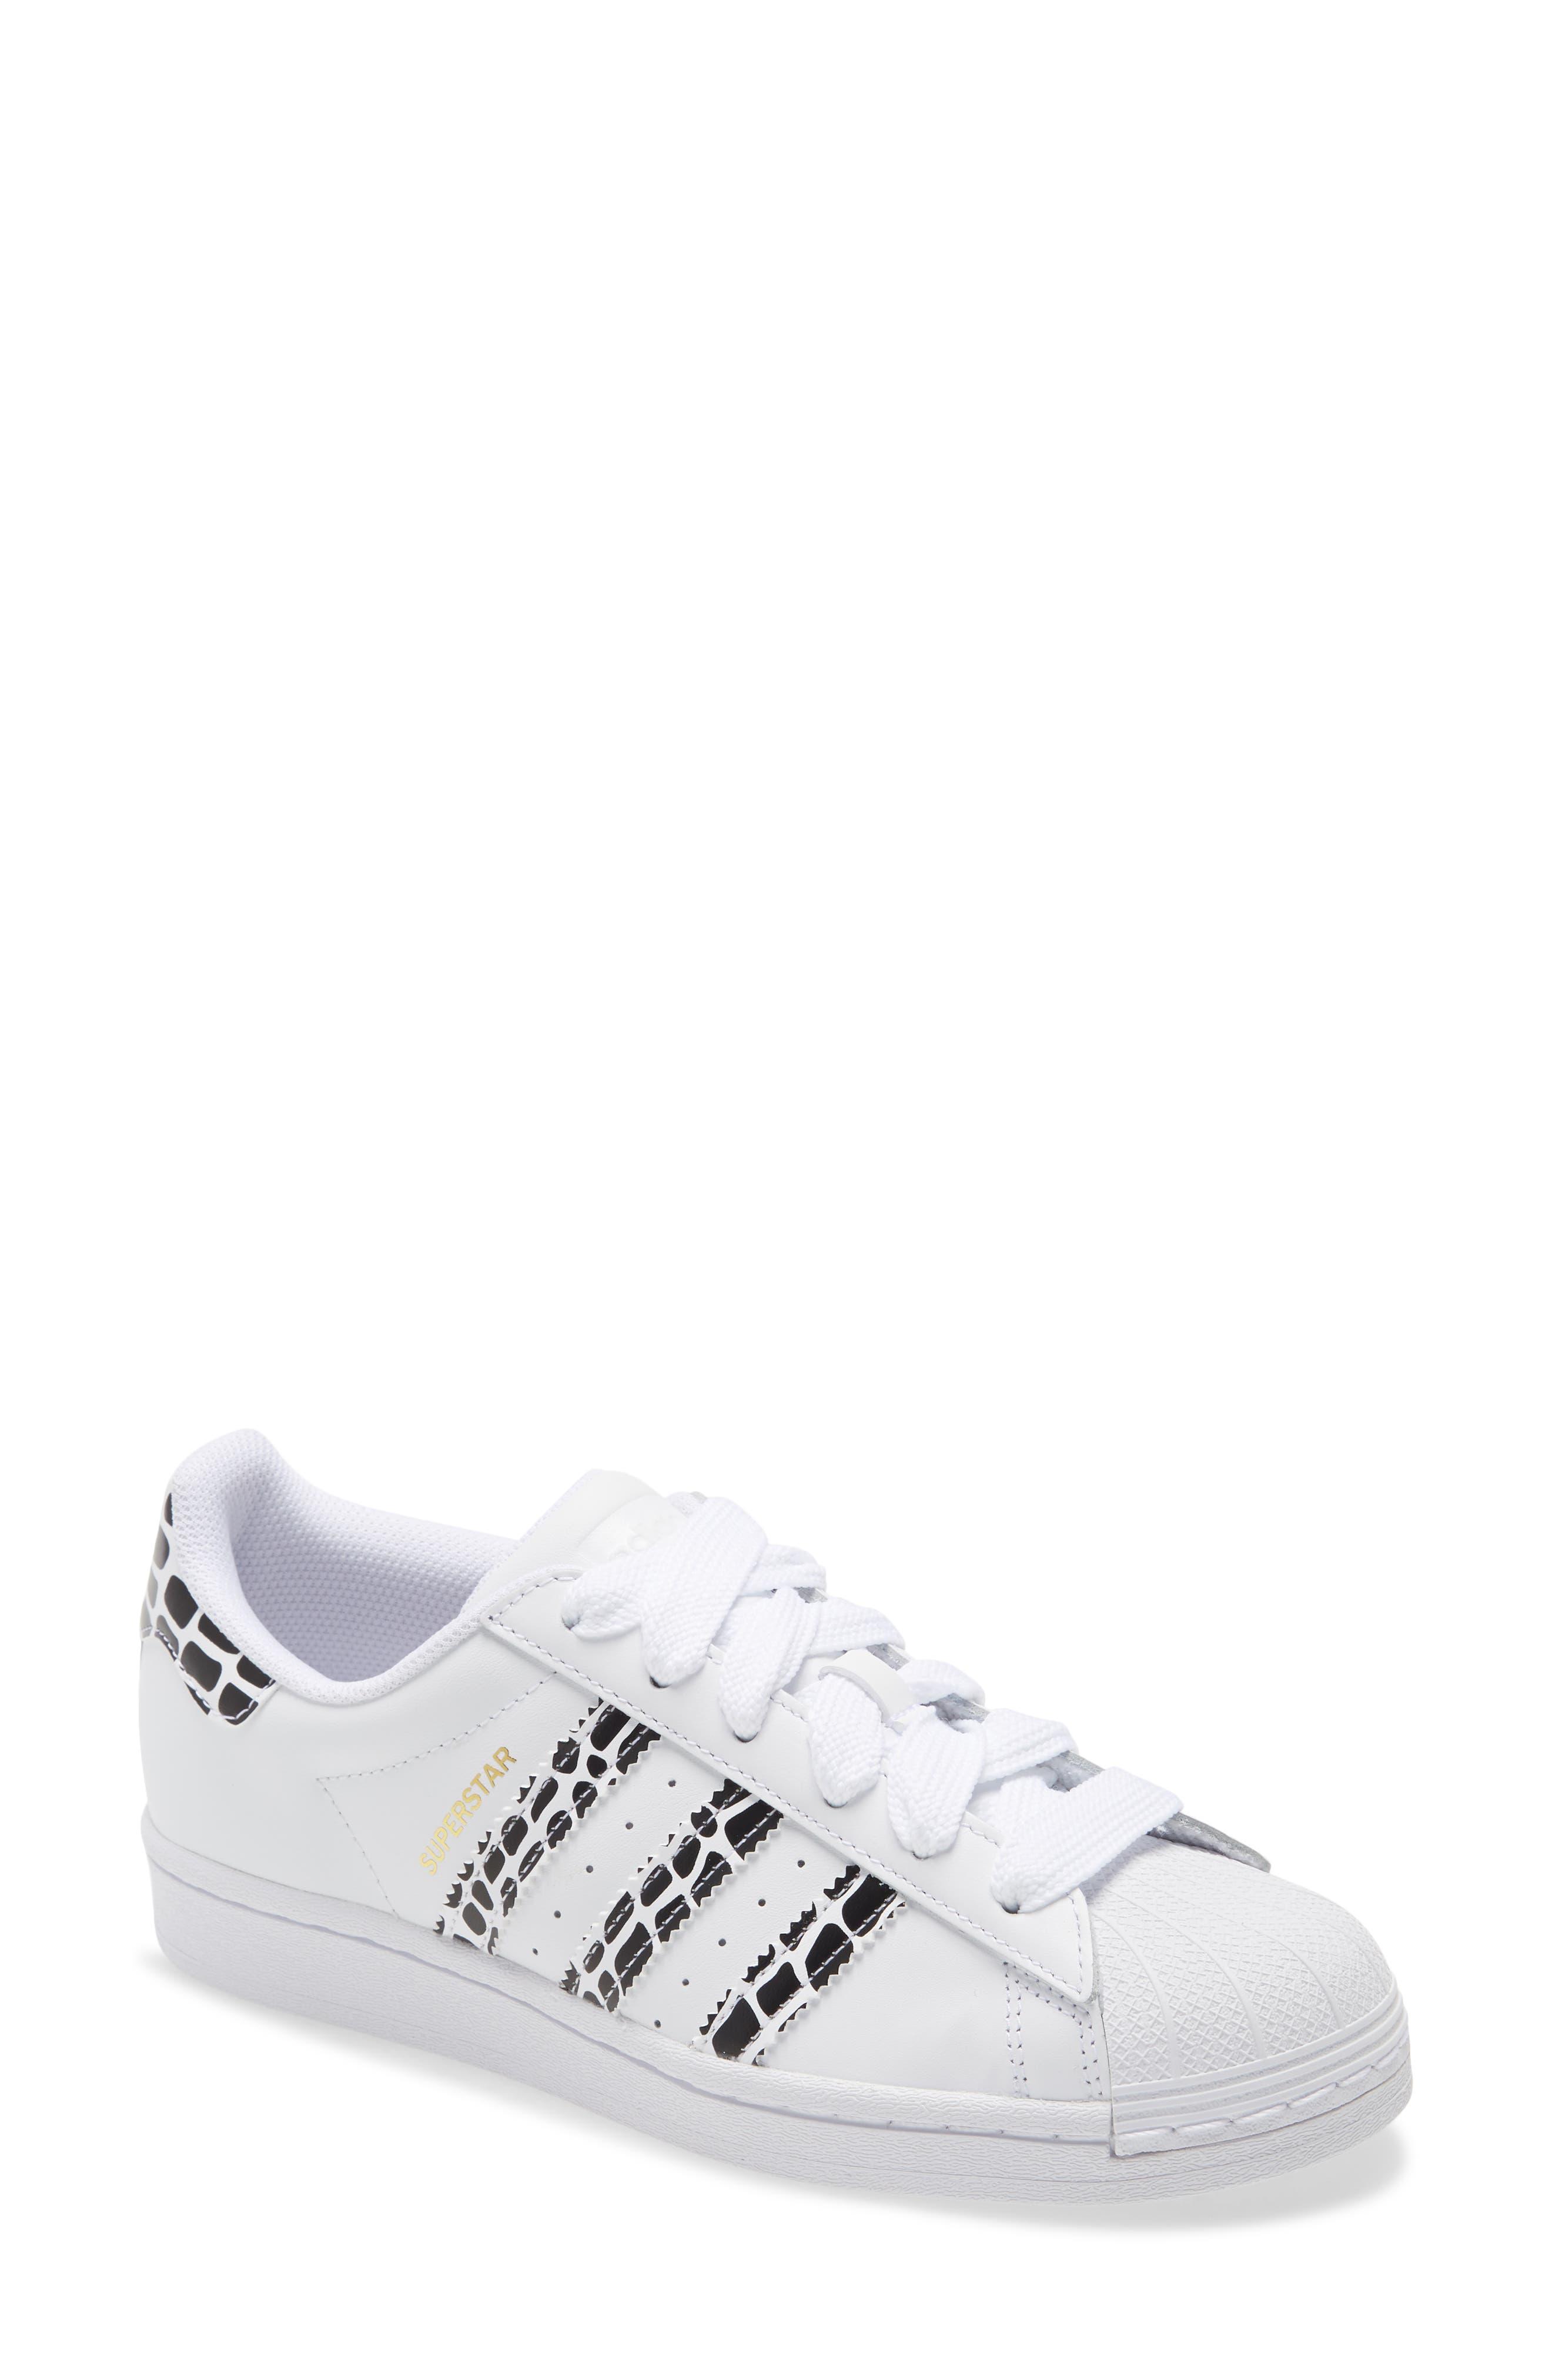 adidas shoes women sale